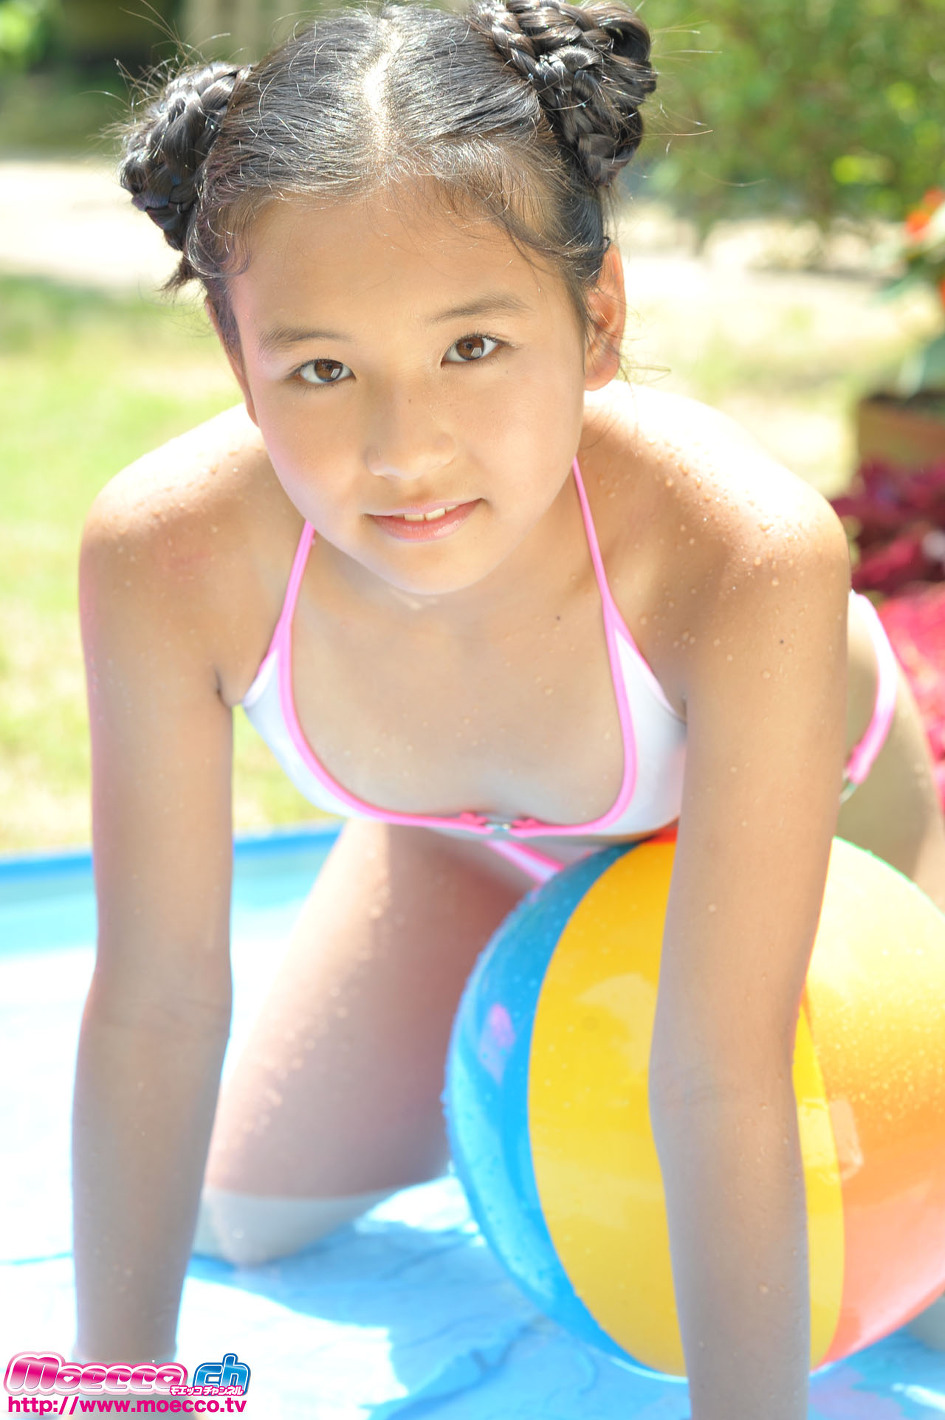 moecco.tv Aoi Kako http://blog.daum.net/ssddddd/17134522